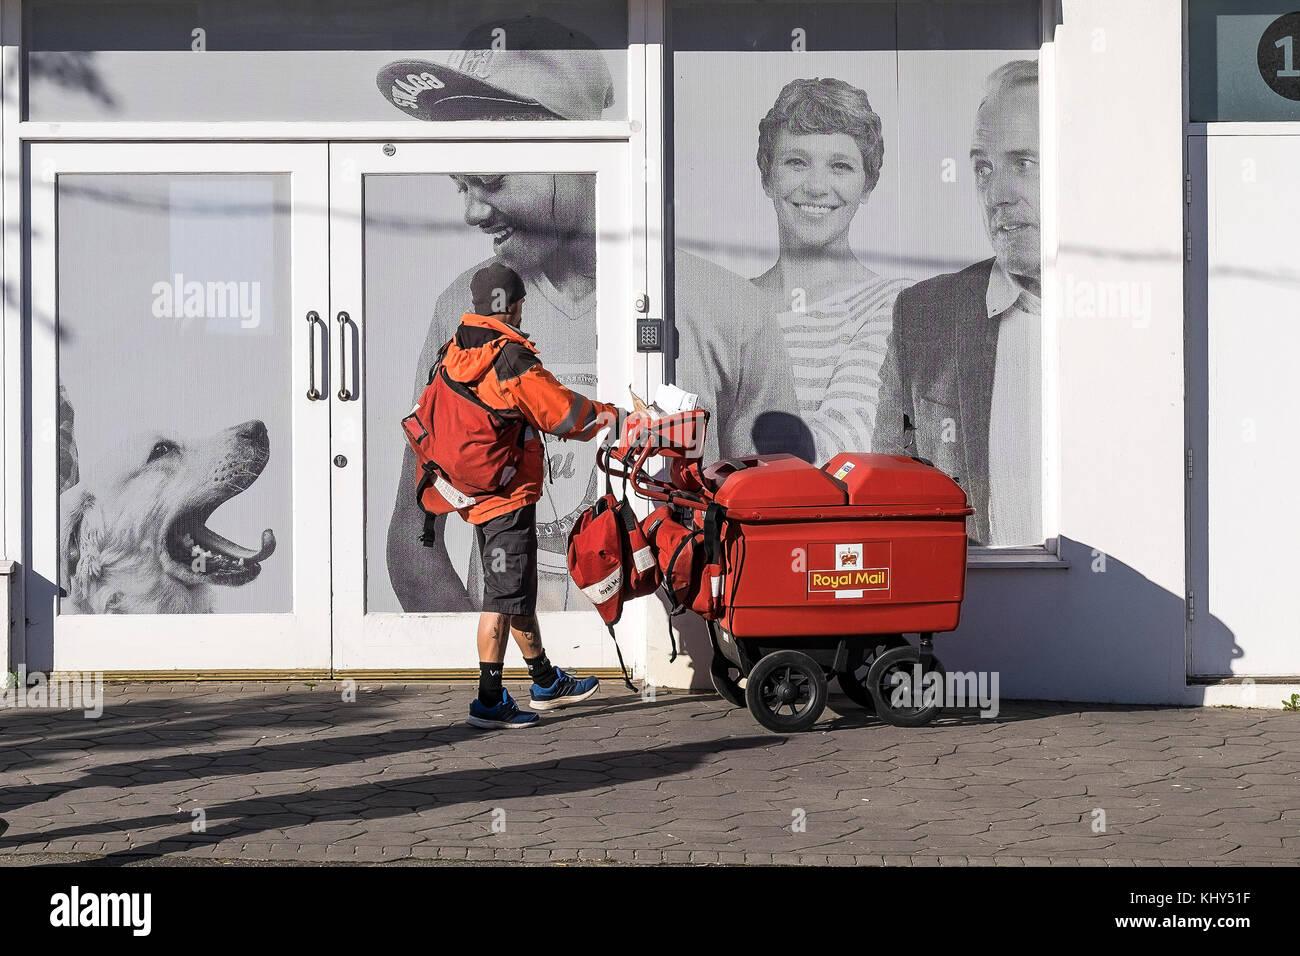 A Royal Mail postman postal worker. - Stock Image